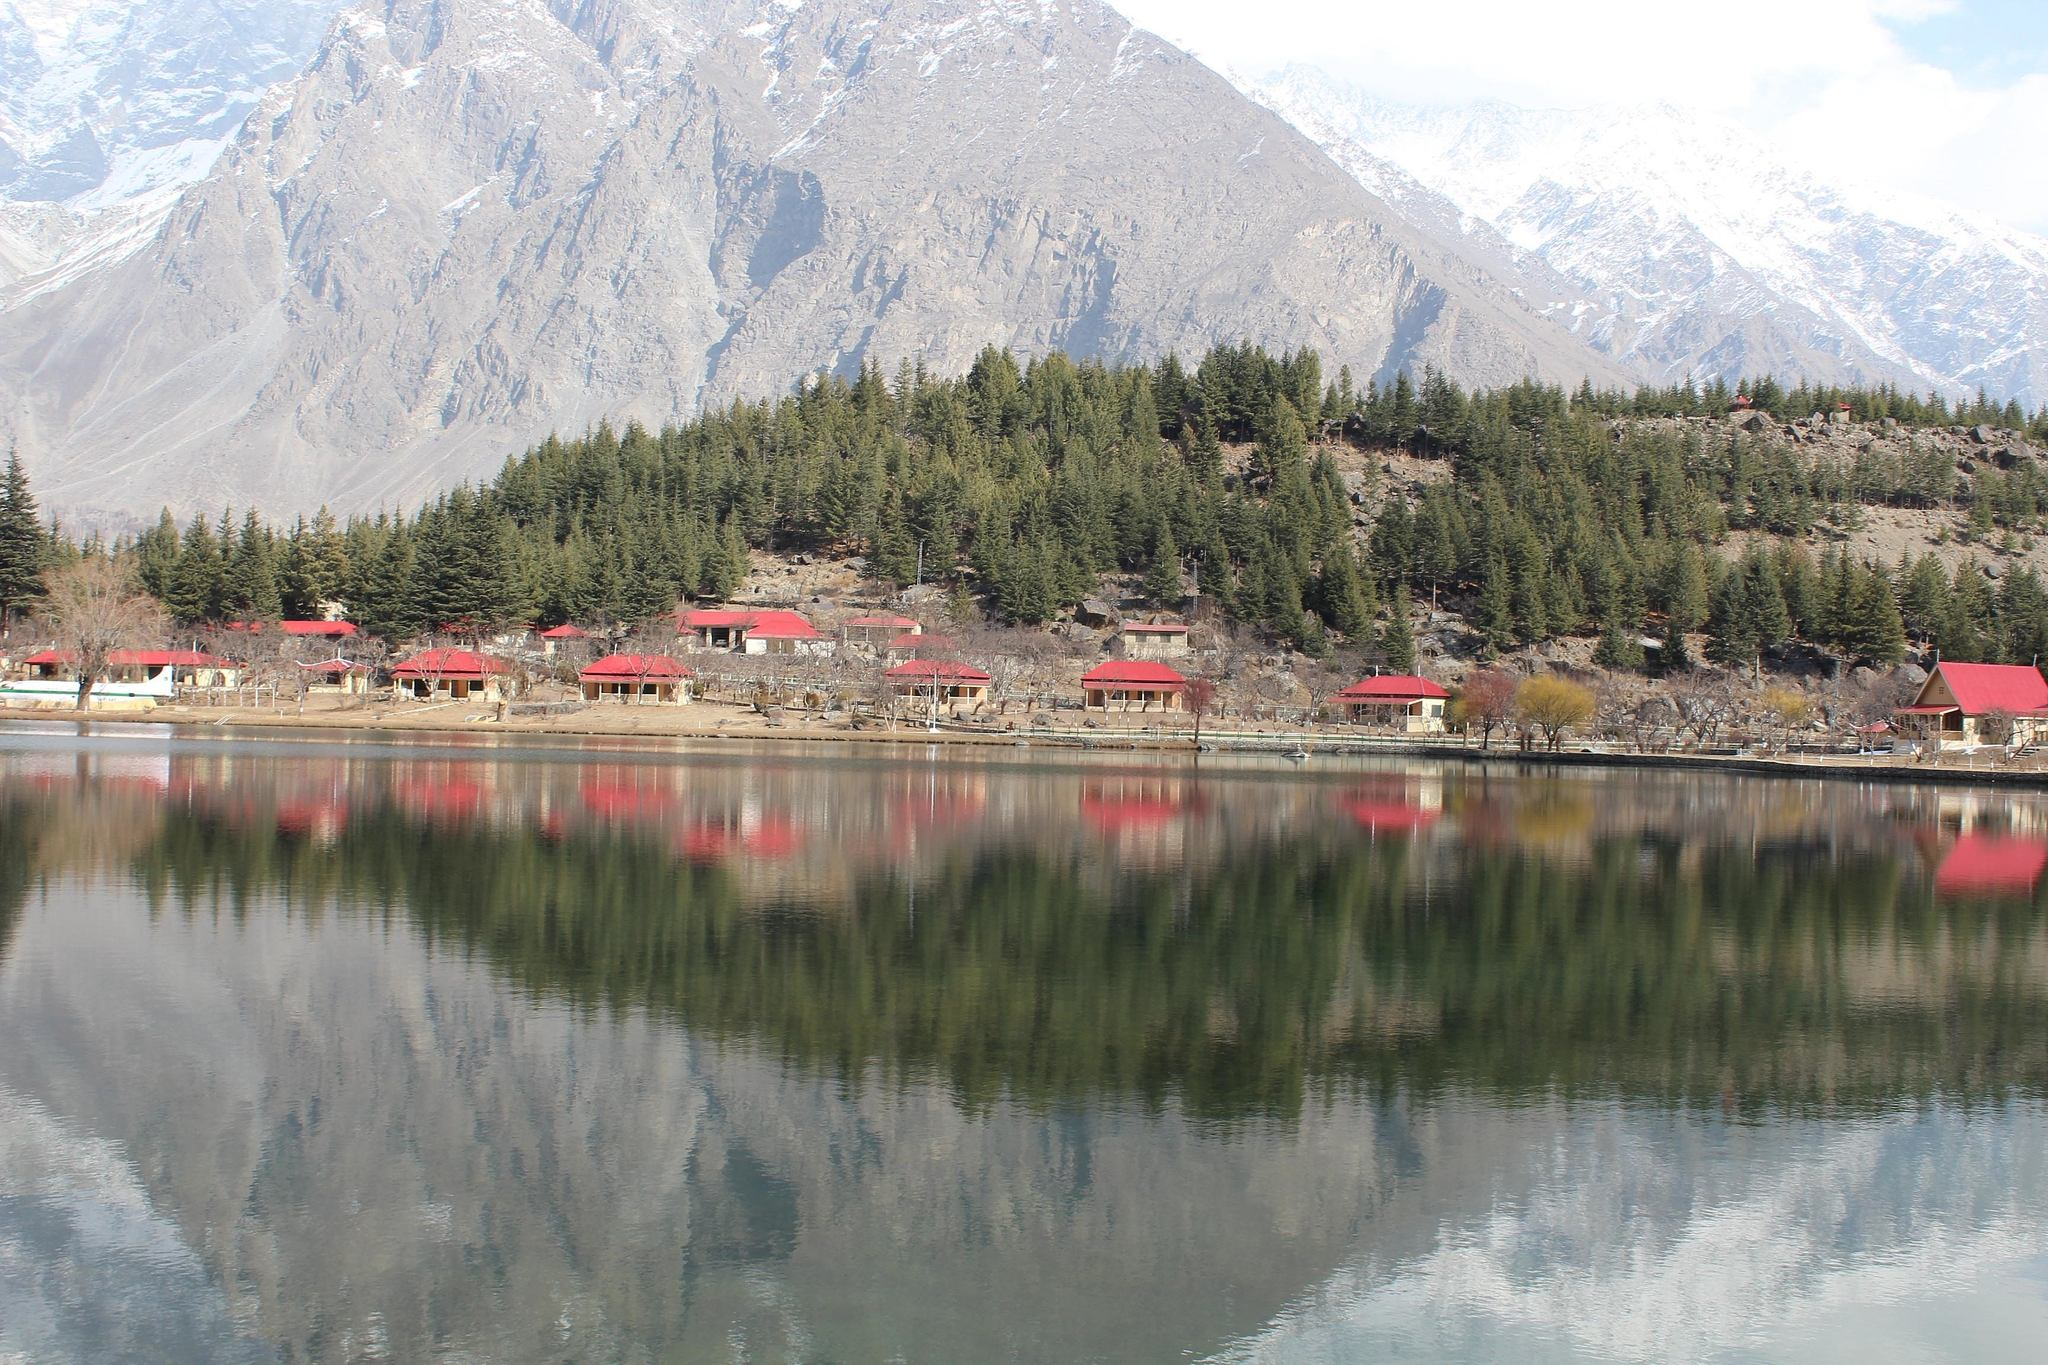 Shangrila Resort – Skardu, Pakistan